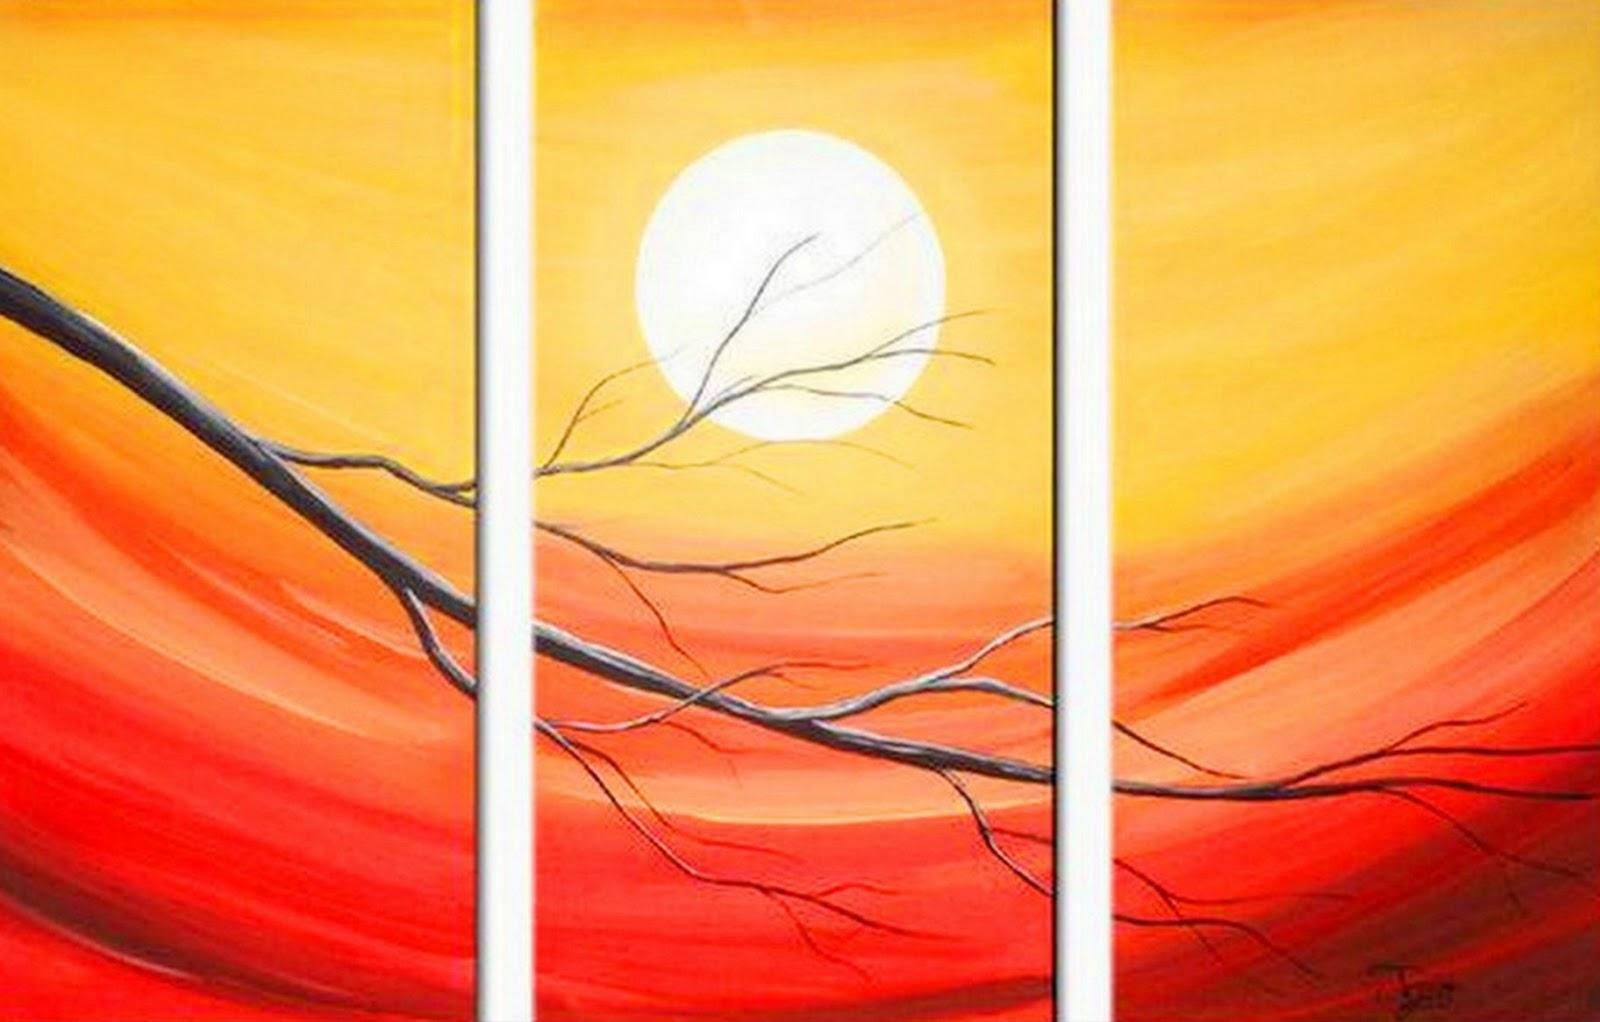 Cuadros modernos pinturas y dibujos cuadros tr pticos de paisajes modernos - Como pintar cuadros faciles ...